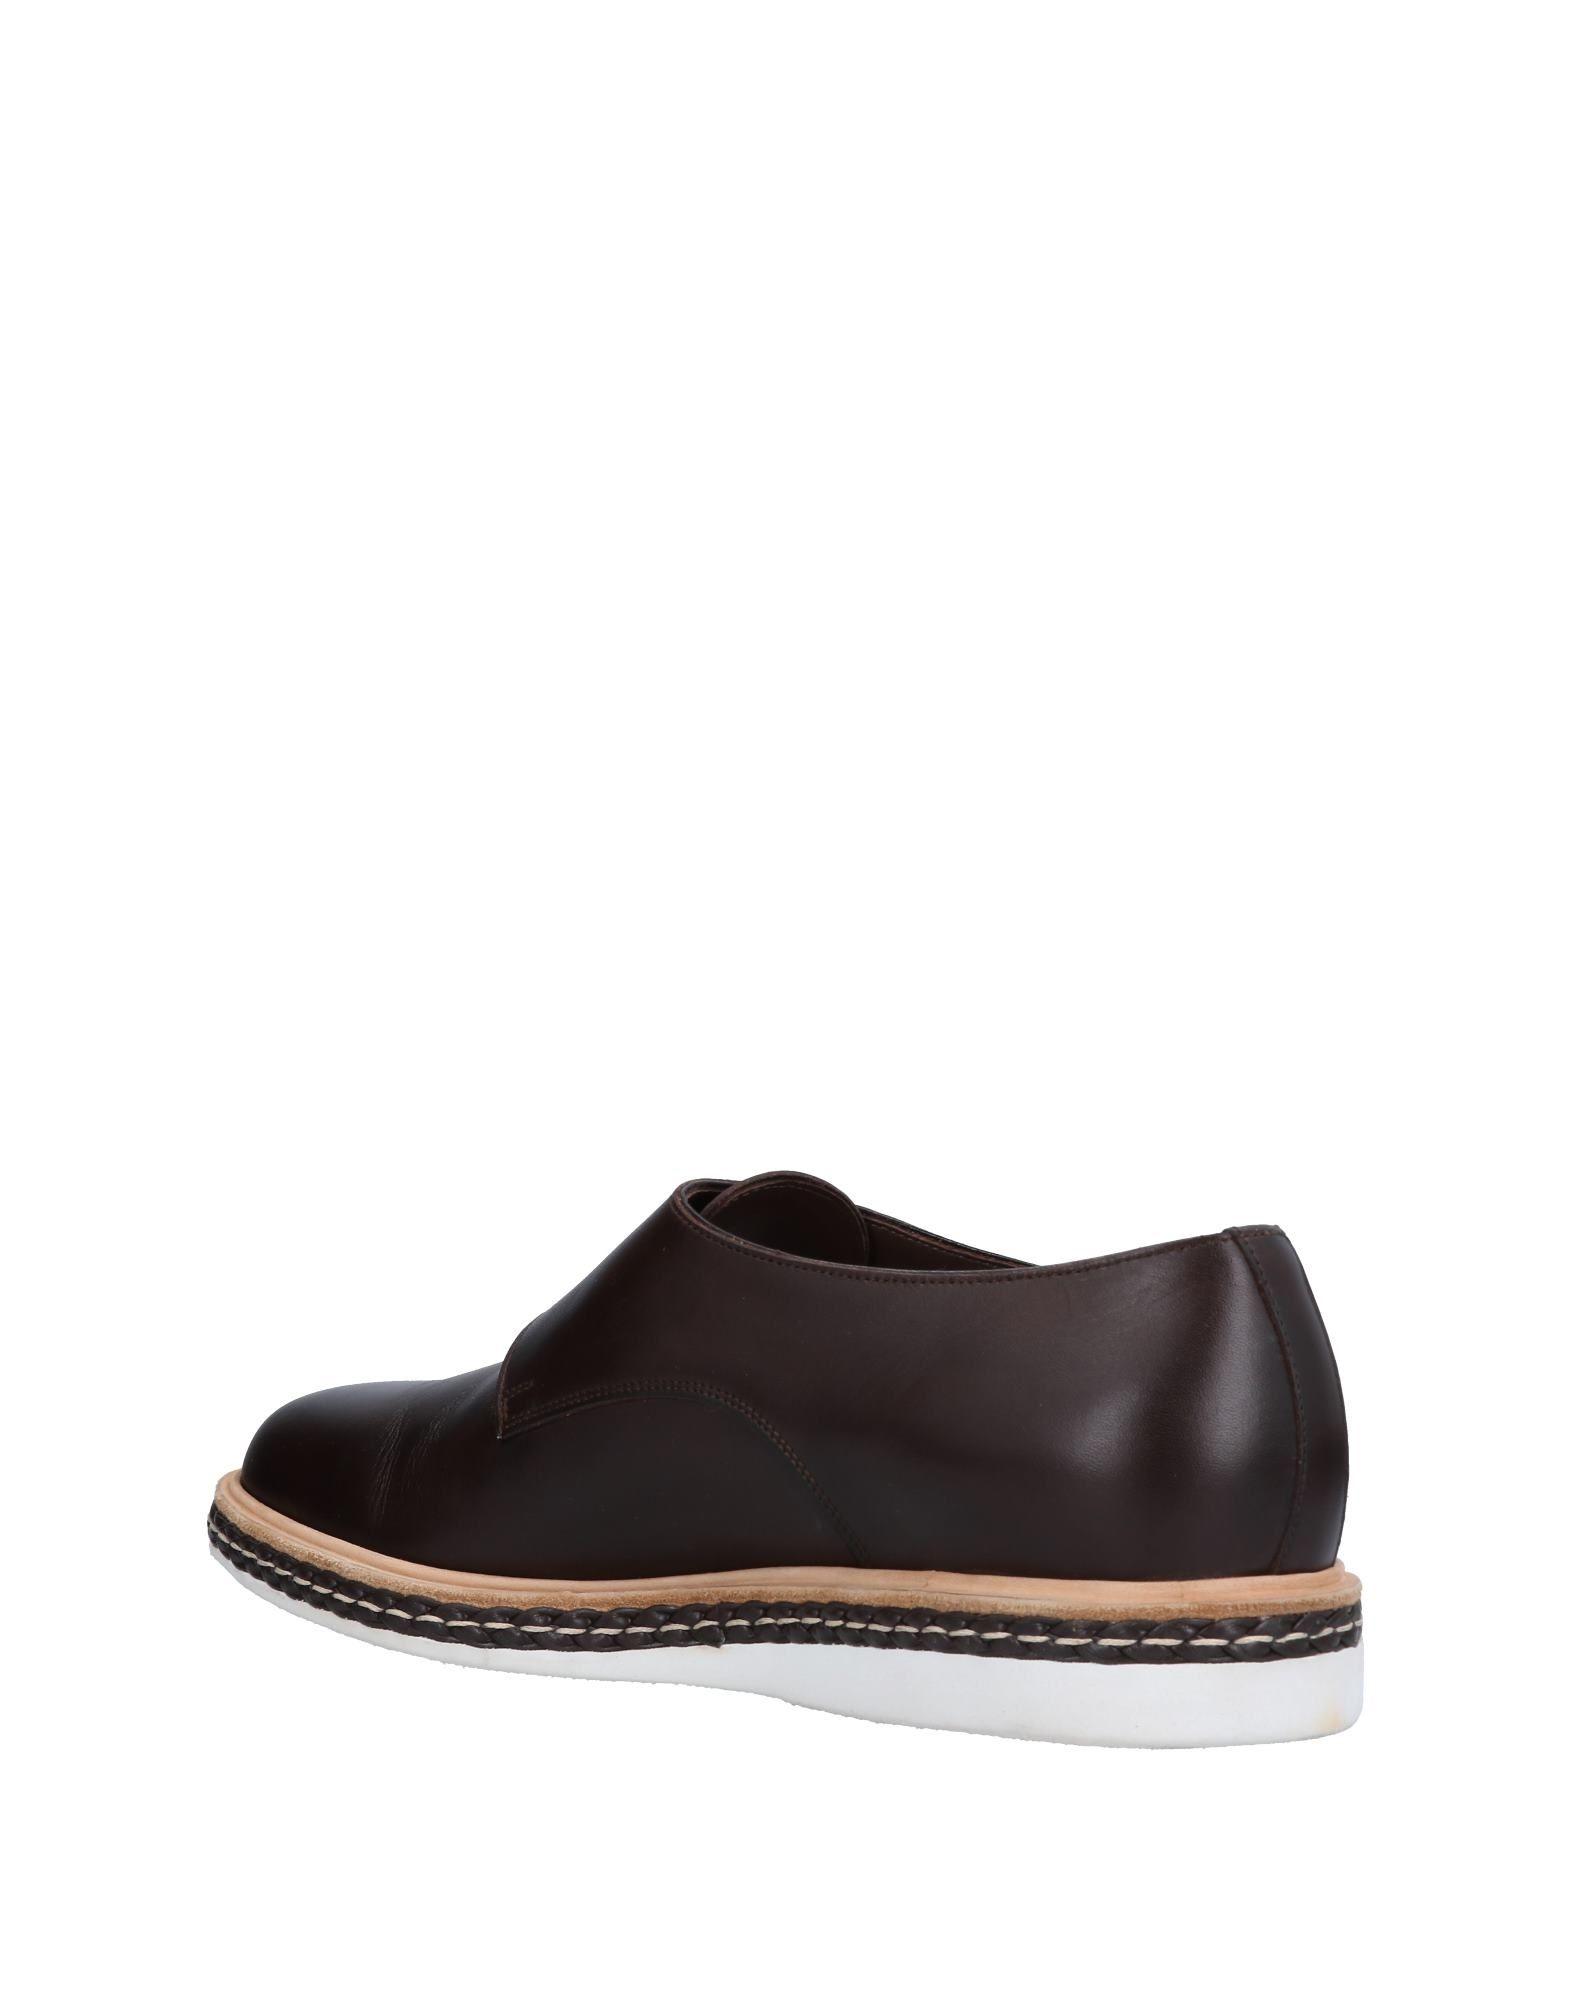 Santoni Mokassins Herren  11501289NC Gute Qualität beliebte Schuhe